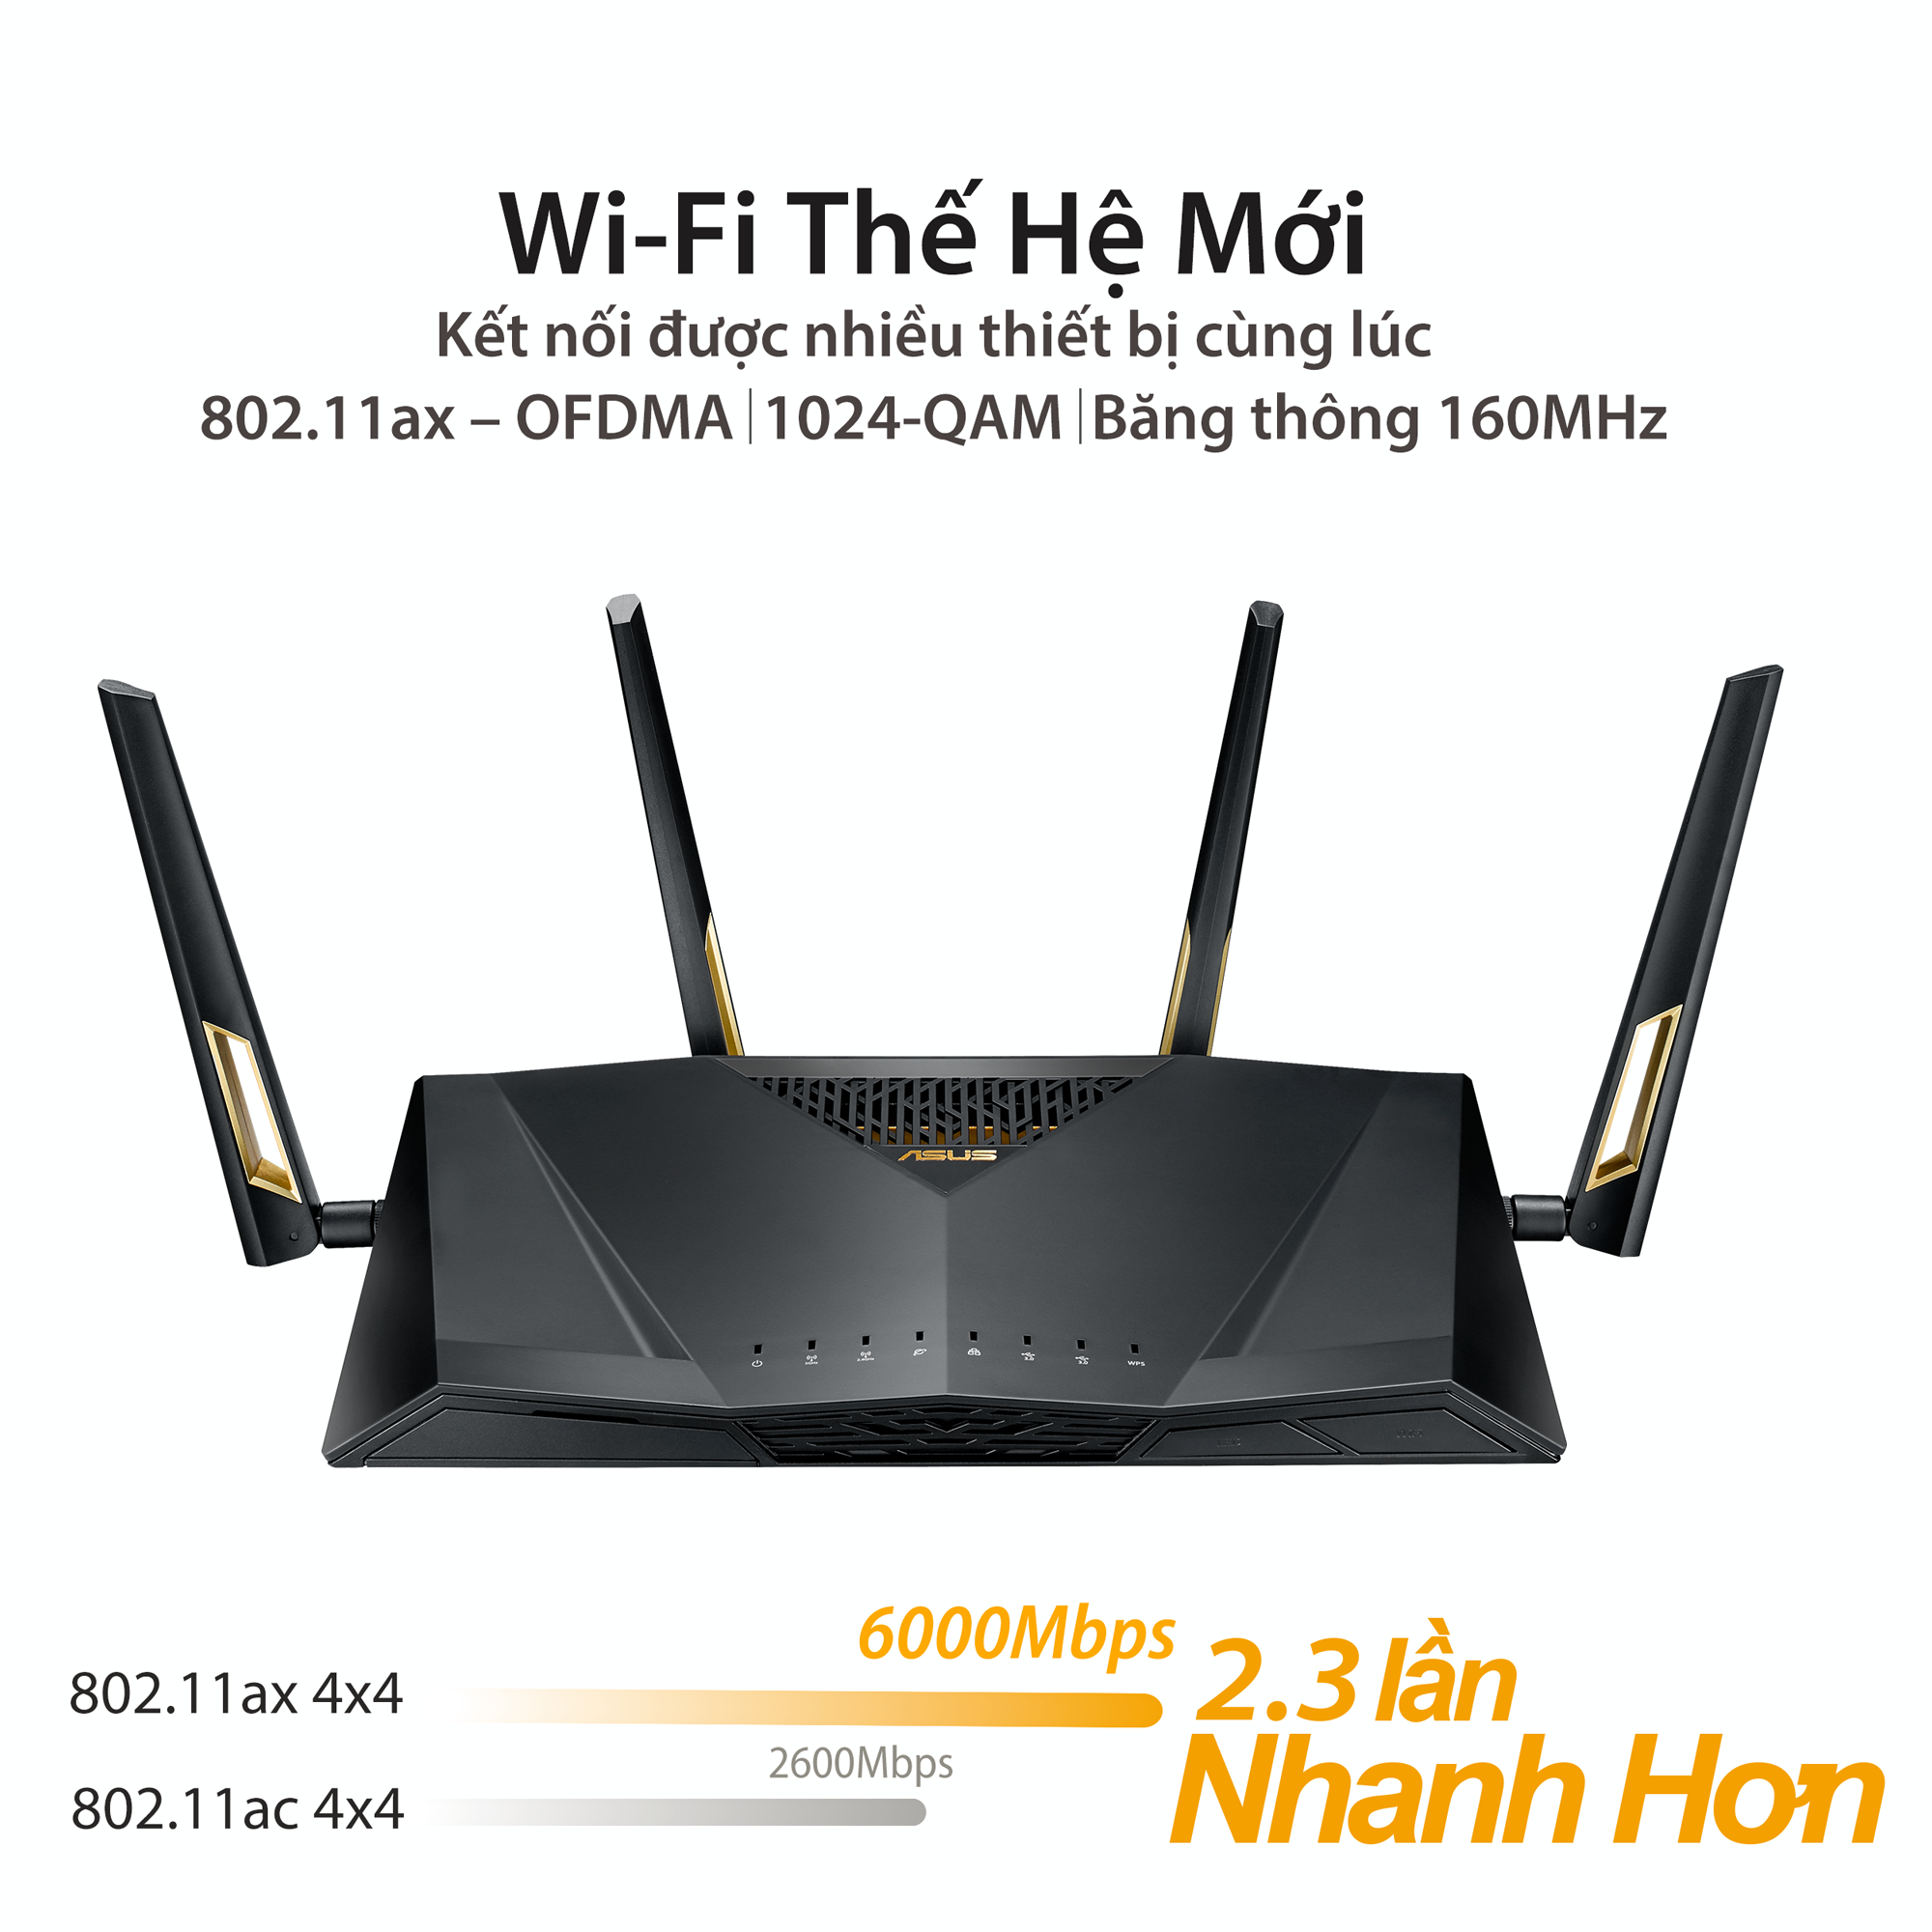 ASUS RT-AX88U (Gaming Router) Wifi AX6000 2 băng tần, Wifi 6 (802.11ax), AiMesh 360 WIFI Mesh, AiProtection, USB 3.1